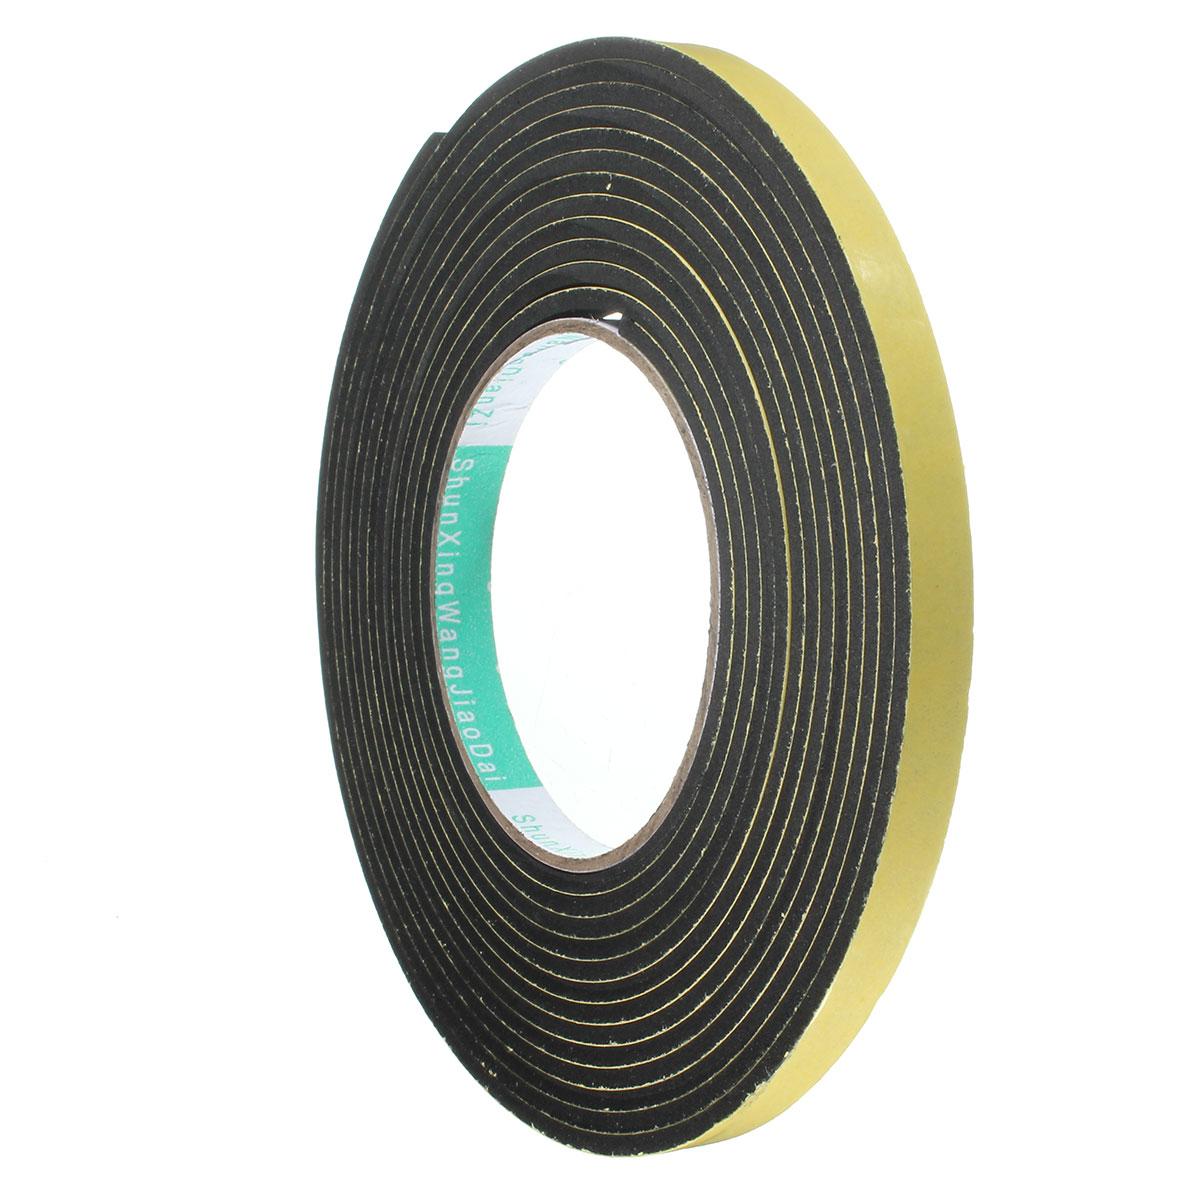 Window Door Foam Adhesive Strip Sealing Tape Adhesive Rubber Weather Strip/_DM